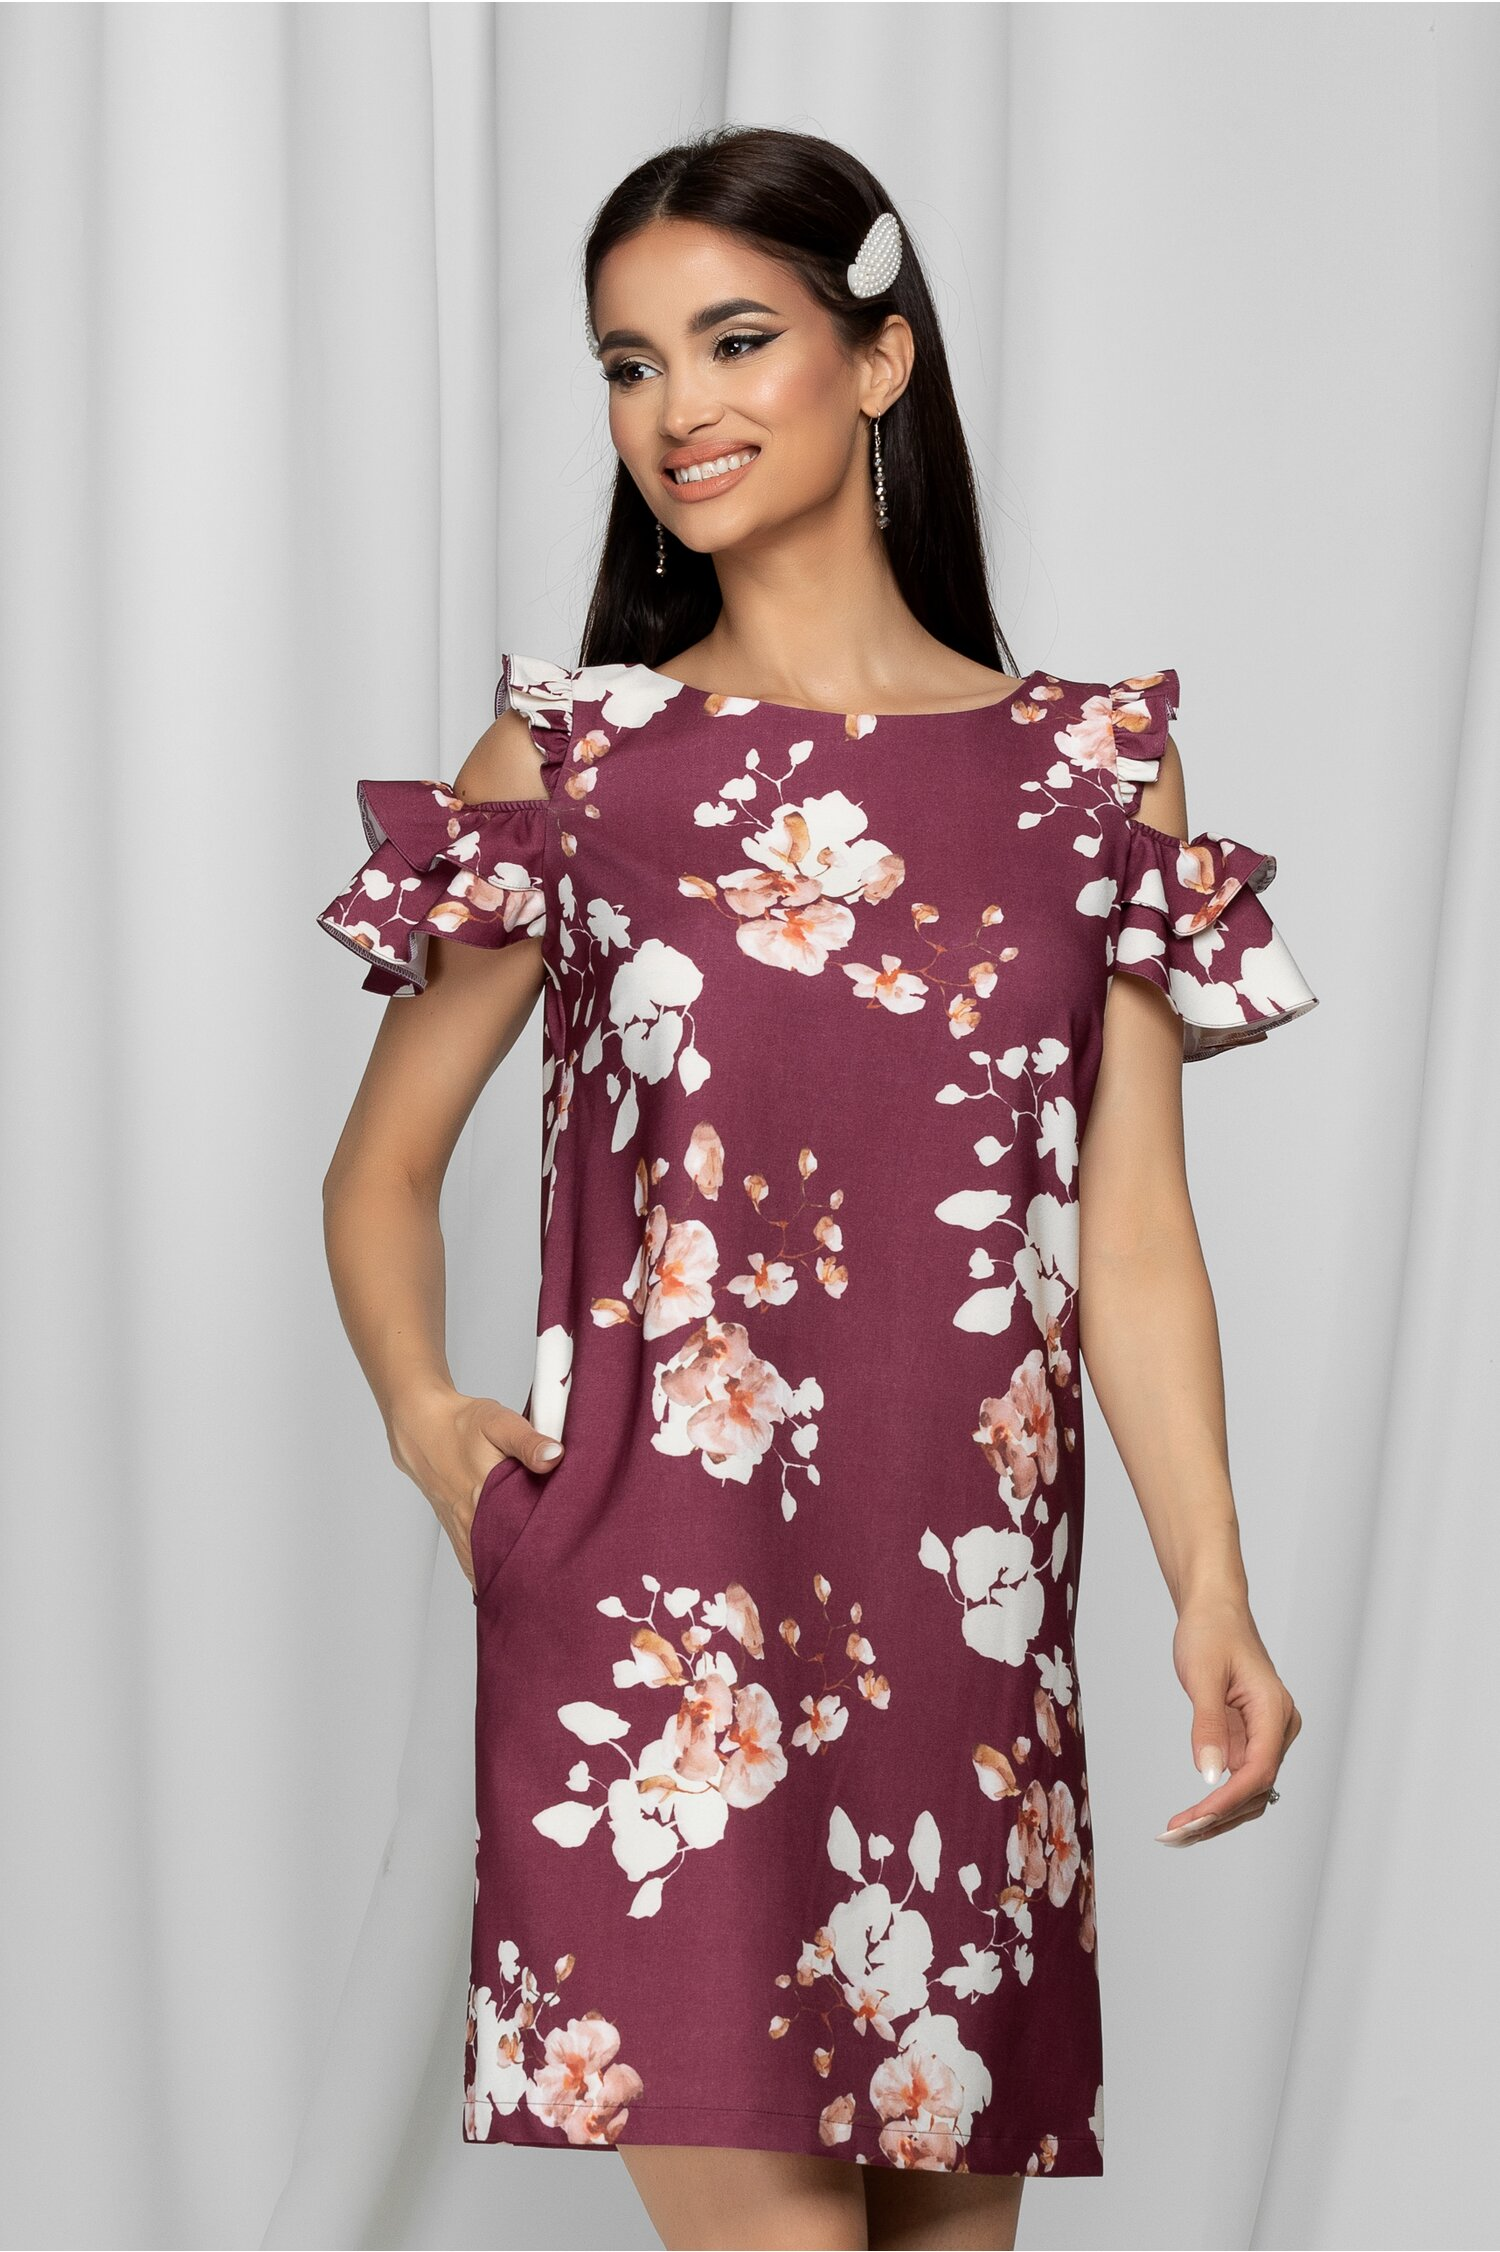 Rochie LaDonna mov cu imprimeu floral bej si buzunare functionale